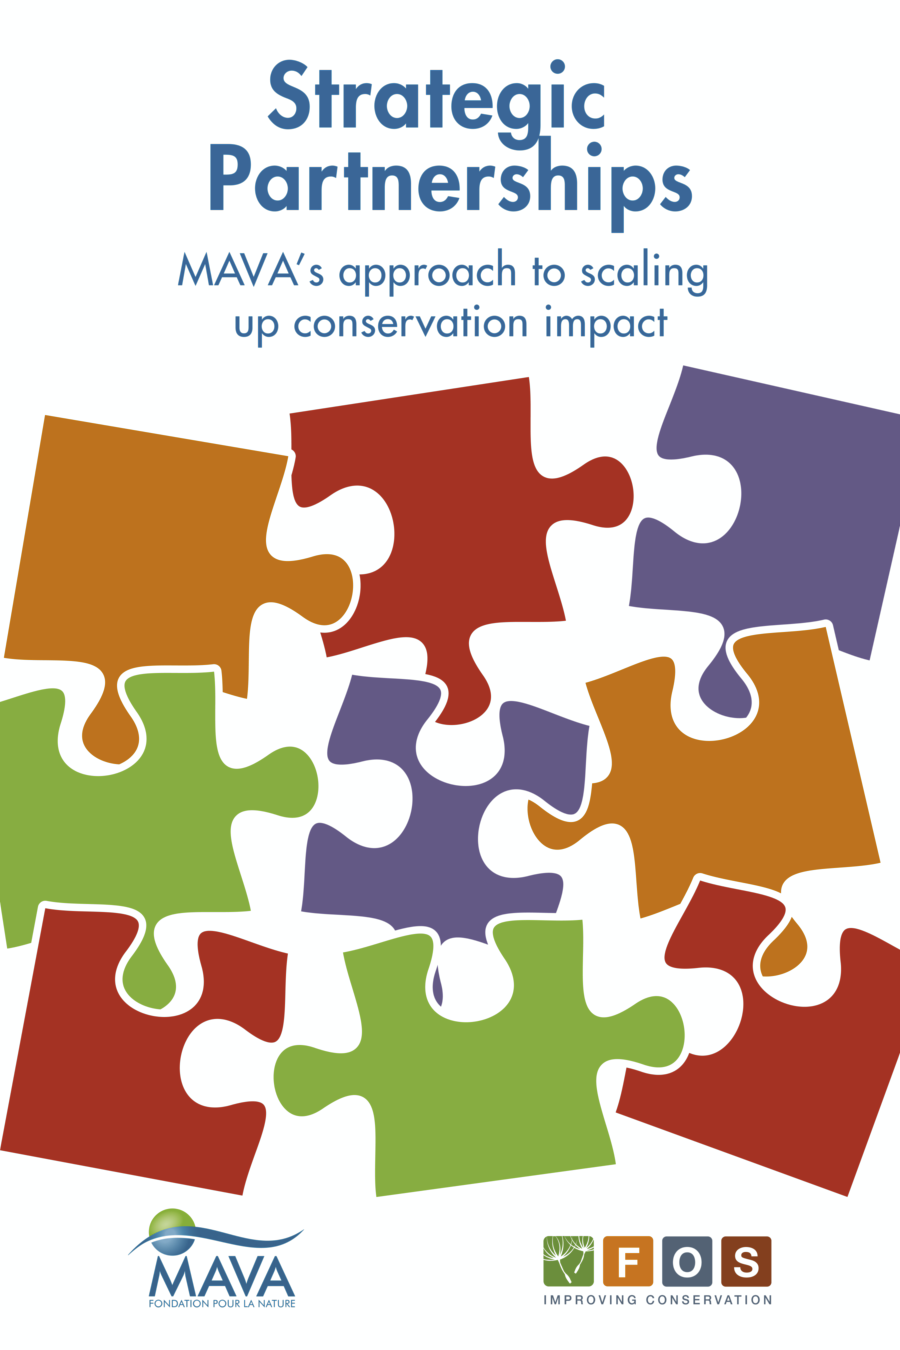 The cover of the MAVA Strategic Partnerships book